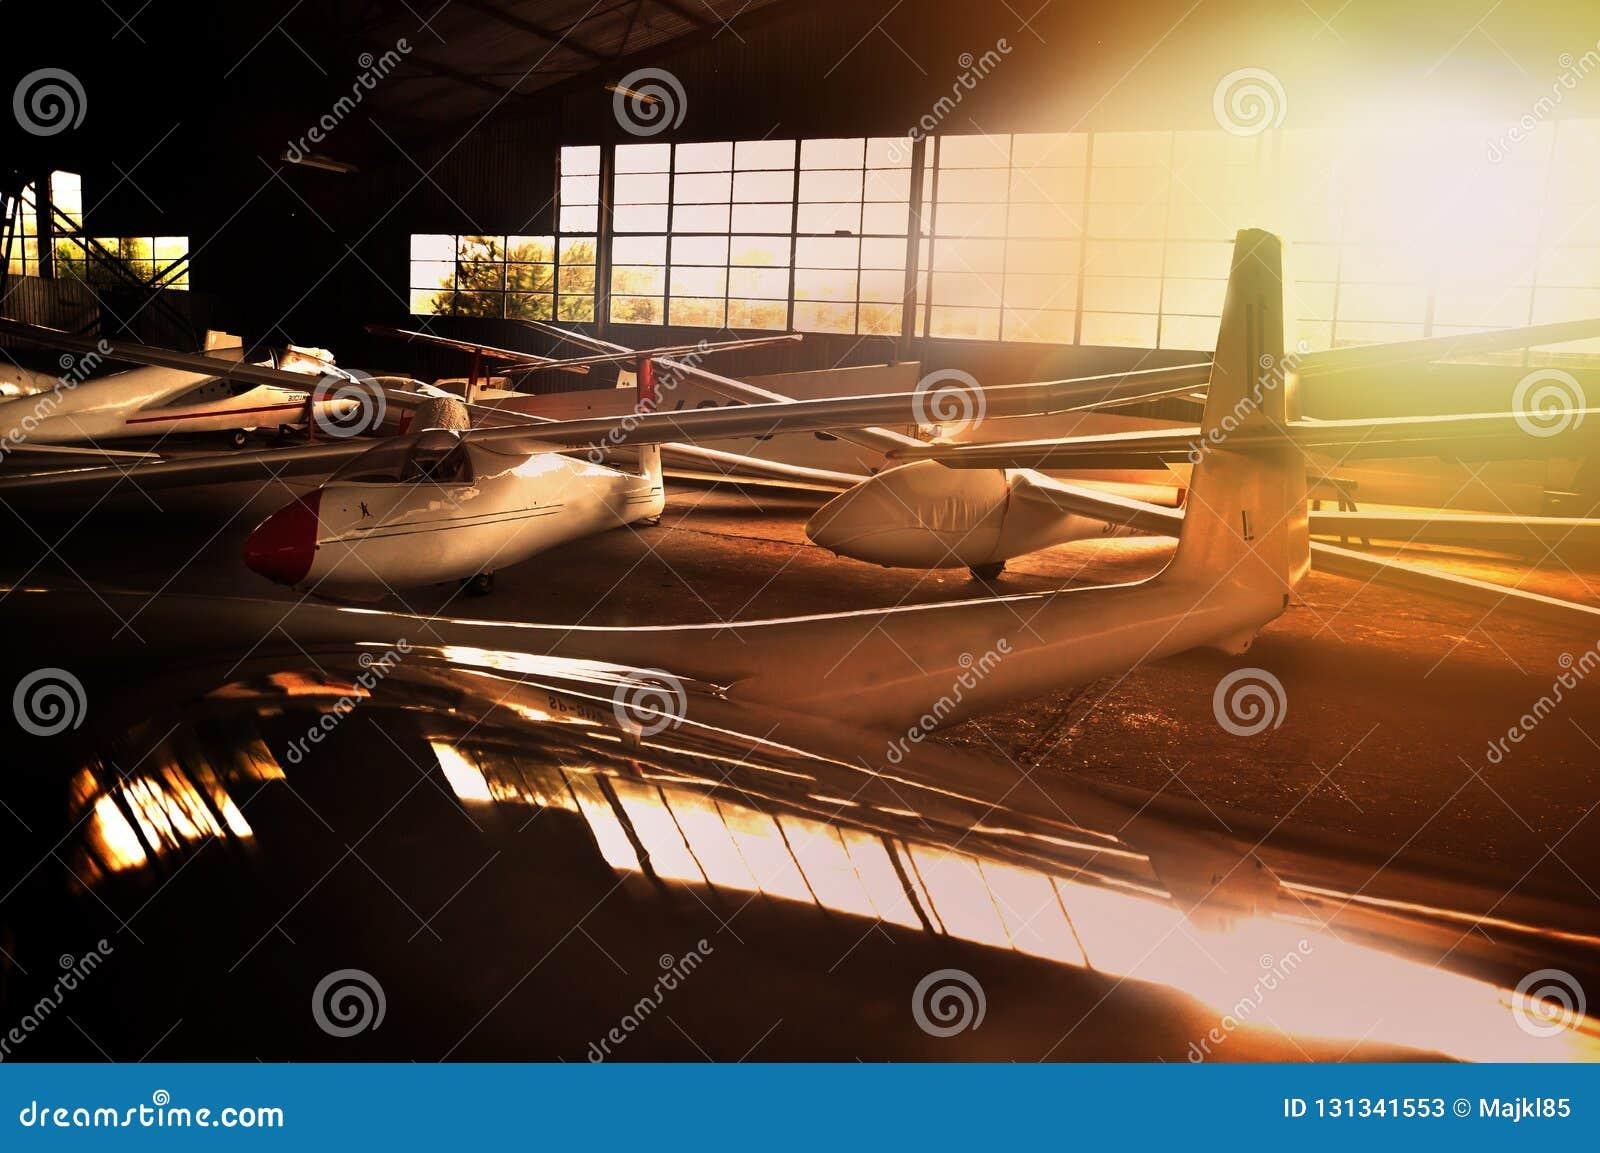 Hangar full of gliders